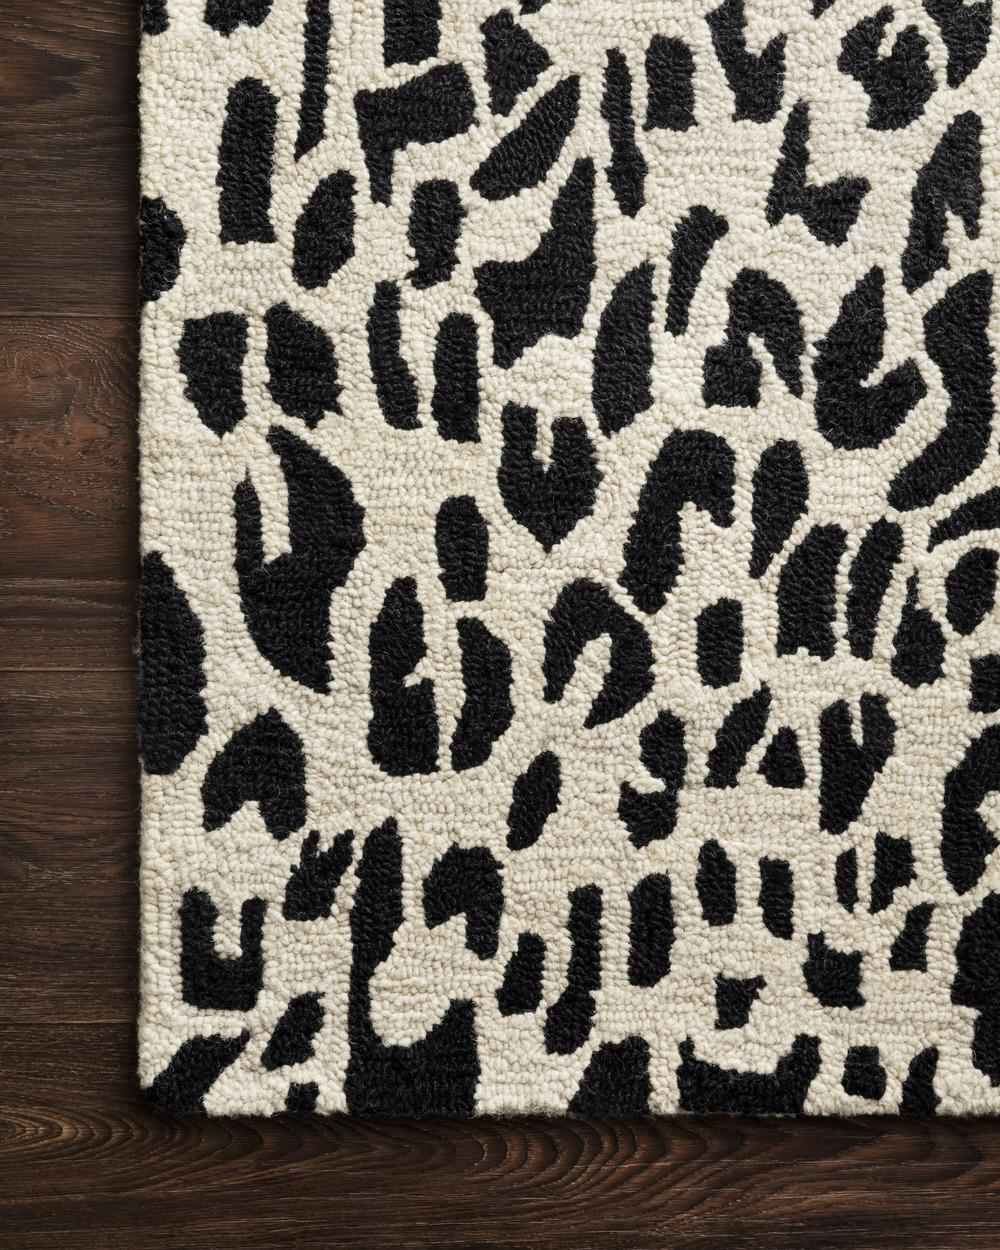 Loloi Rugs - Masai Rug (Black/Ivory)